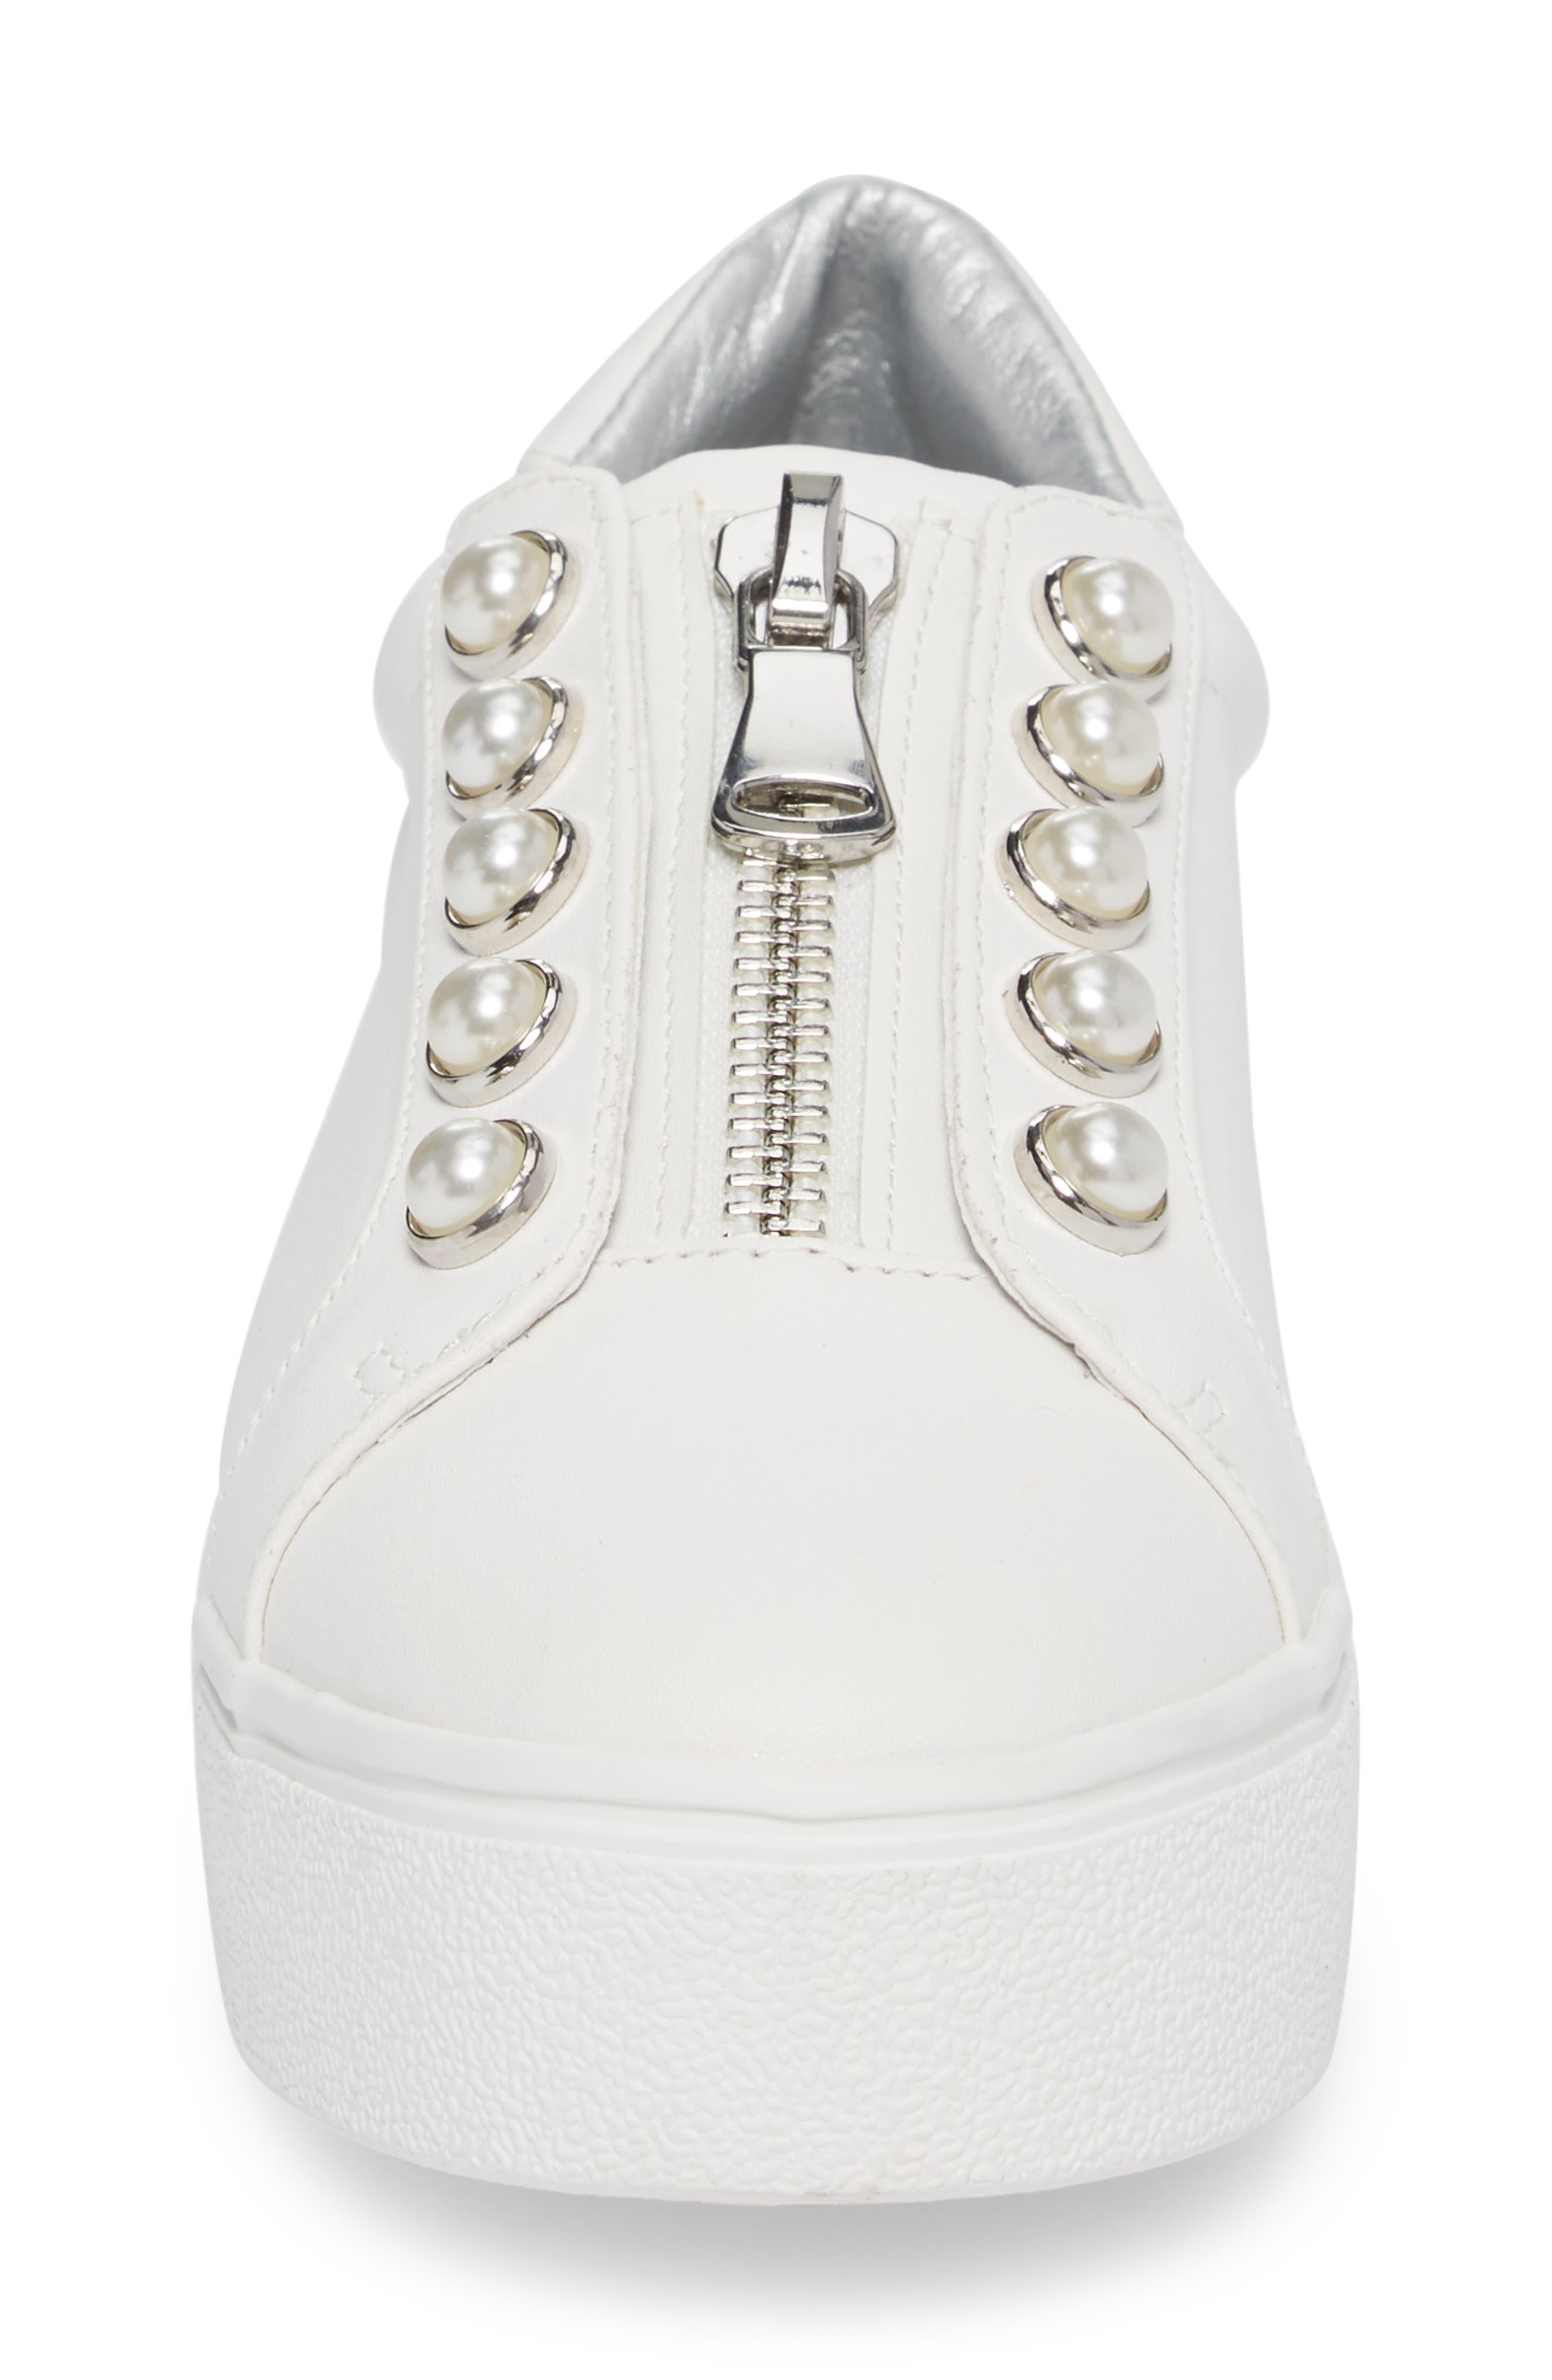 Lynn Embellished Platform Sneaker,                             Alternate thumbnail 4, color,                             White Faux Leather